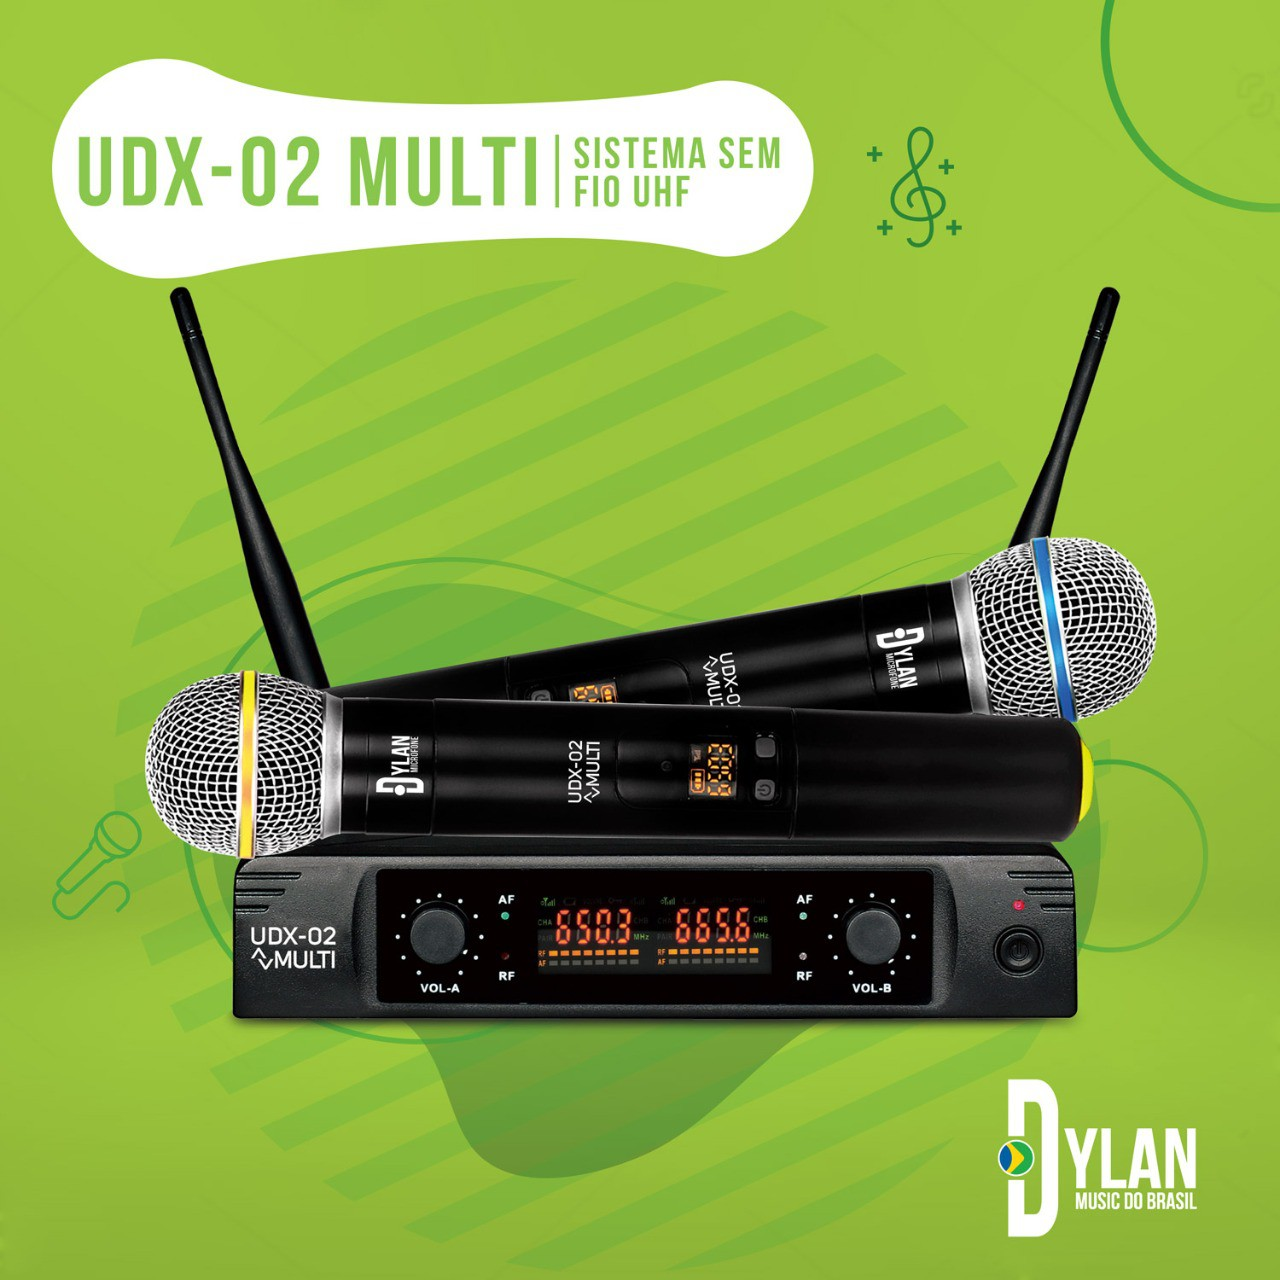 MICROFONE SEM FIO UDX-02 DYLAN 2x30 FREQUENCIAS